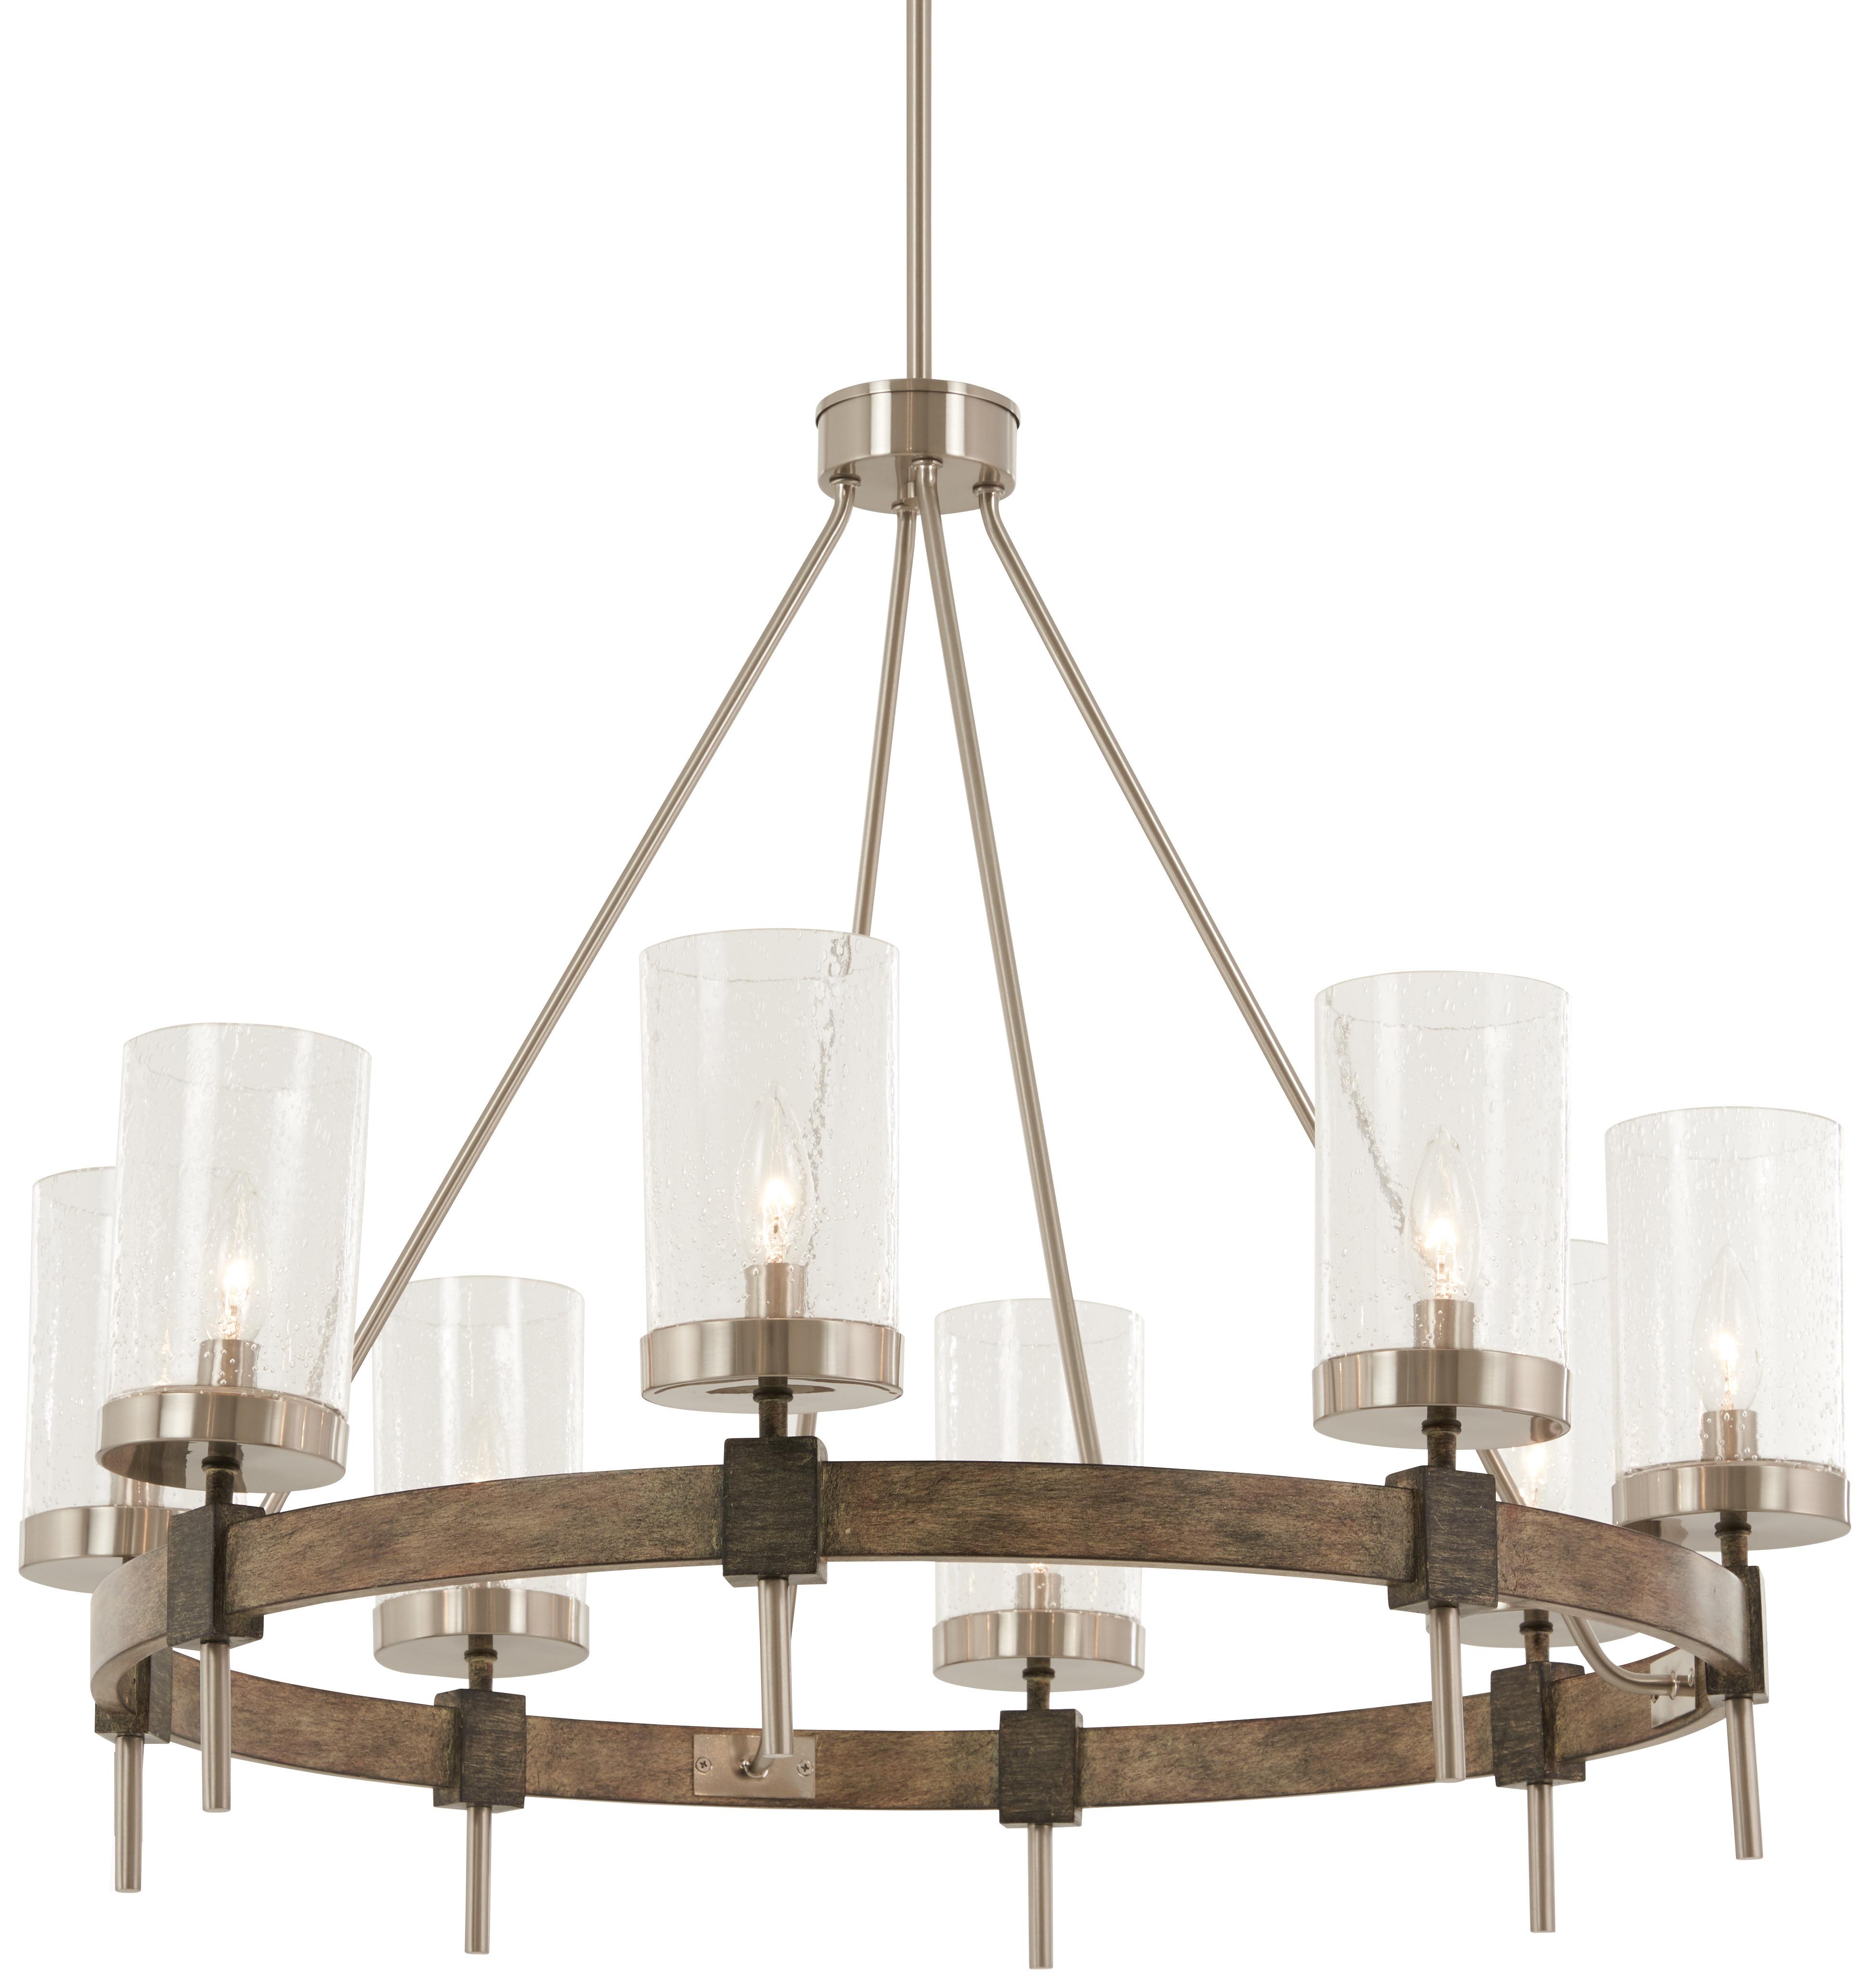 Liska 8 Light Candle Style Chandelier For Trendy Shaylee 8 Light Candle Style Chandeliers (View 14 of 25)